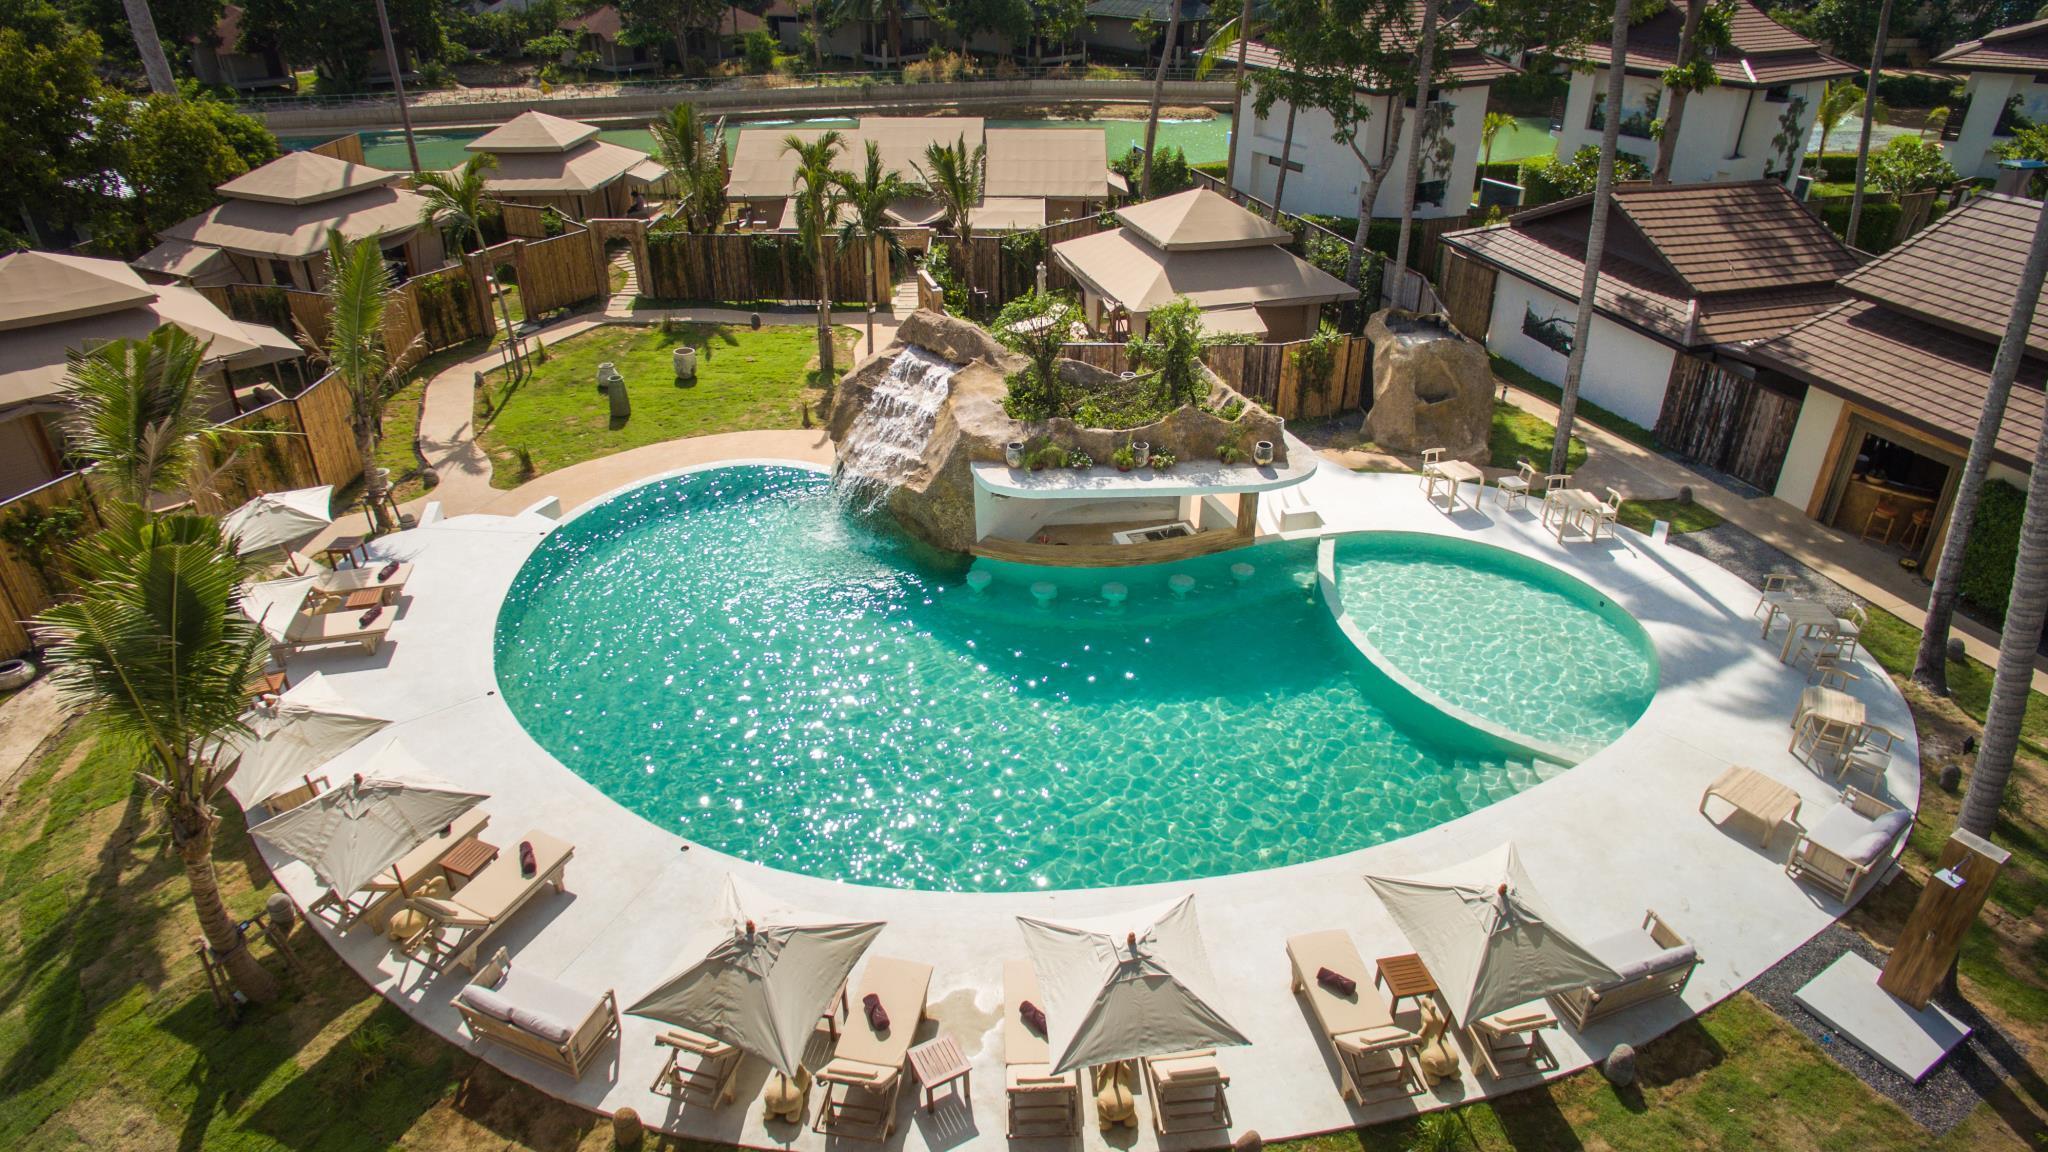 Khwan Beach Resort & Luxury Glamping and Pool Villas Samui - Adults ขวัญ บีช รีสอร์ต แอนด์ ลักชัวรี แกลมปิง แอนด์ พูล วิลลา สมุย - สำหรับผู้ใหญ่เท่า